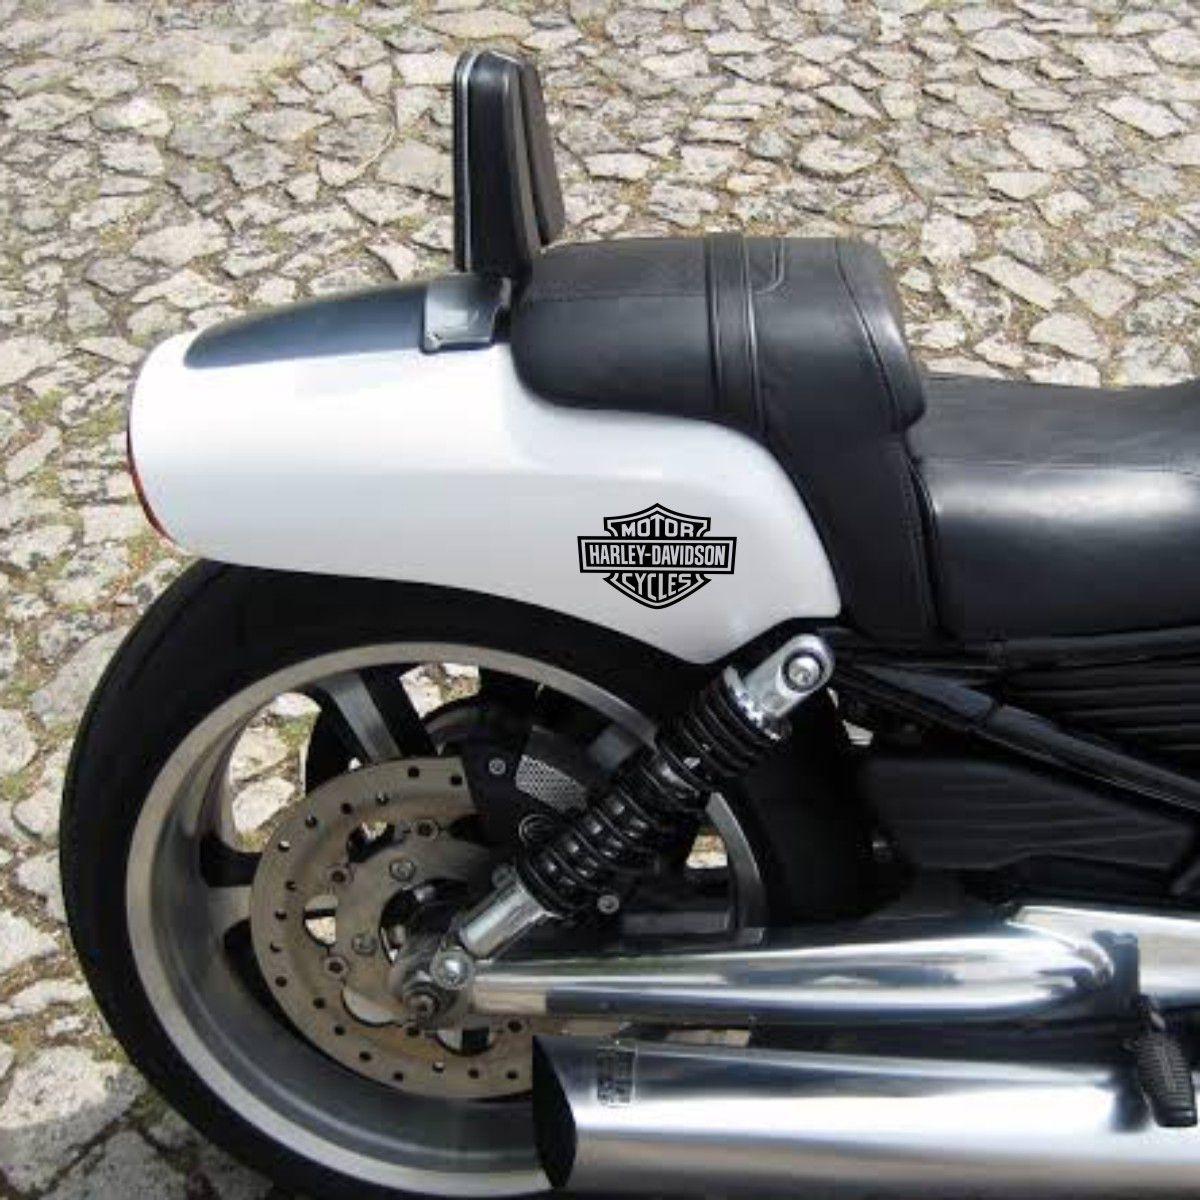 Kit com 3 Adesivos Harley Davidson - 10x7,5cm cada